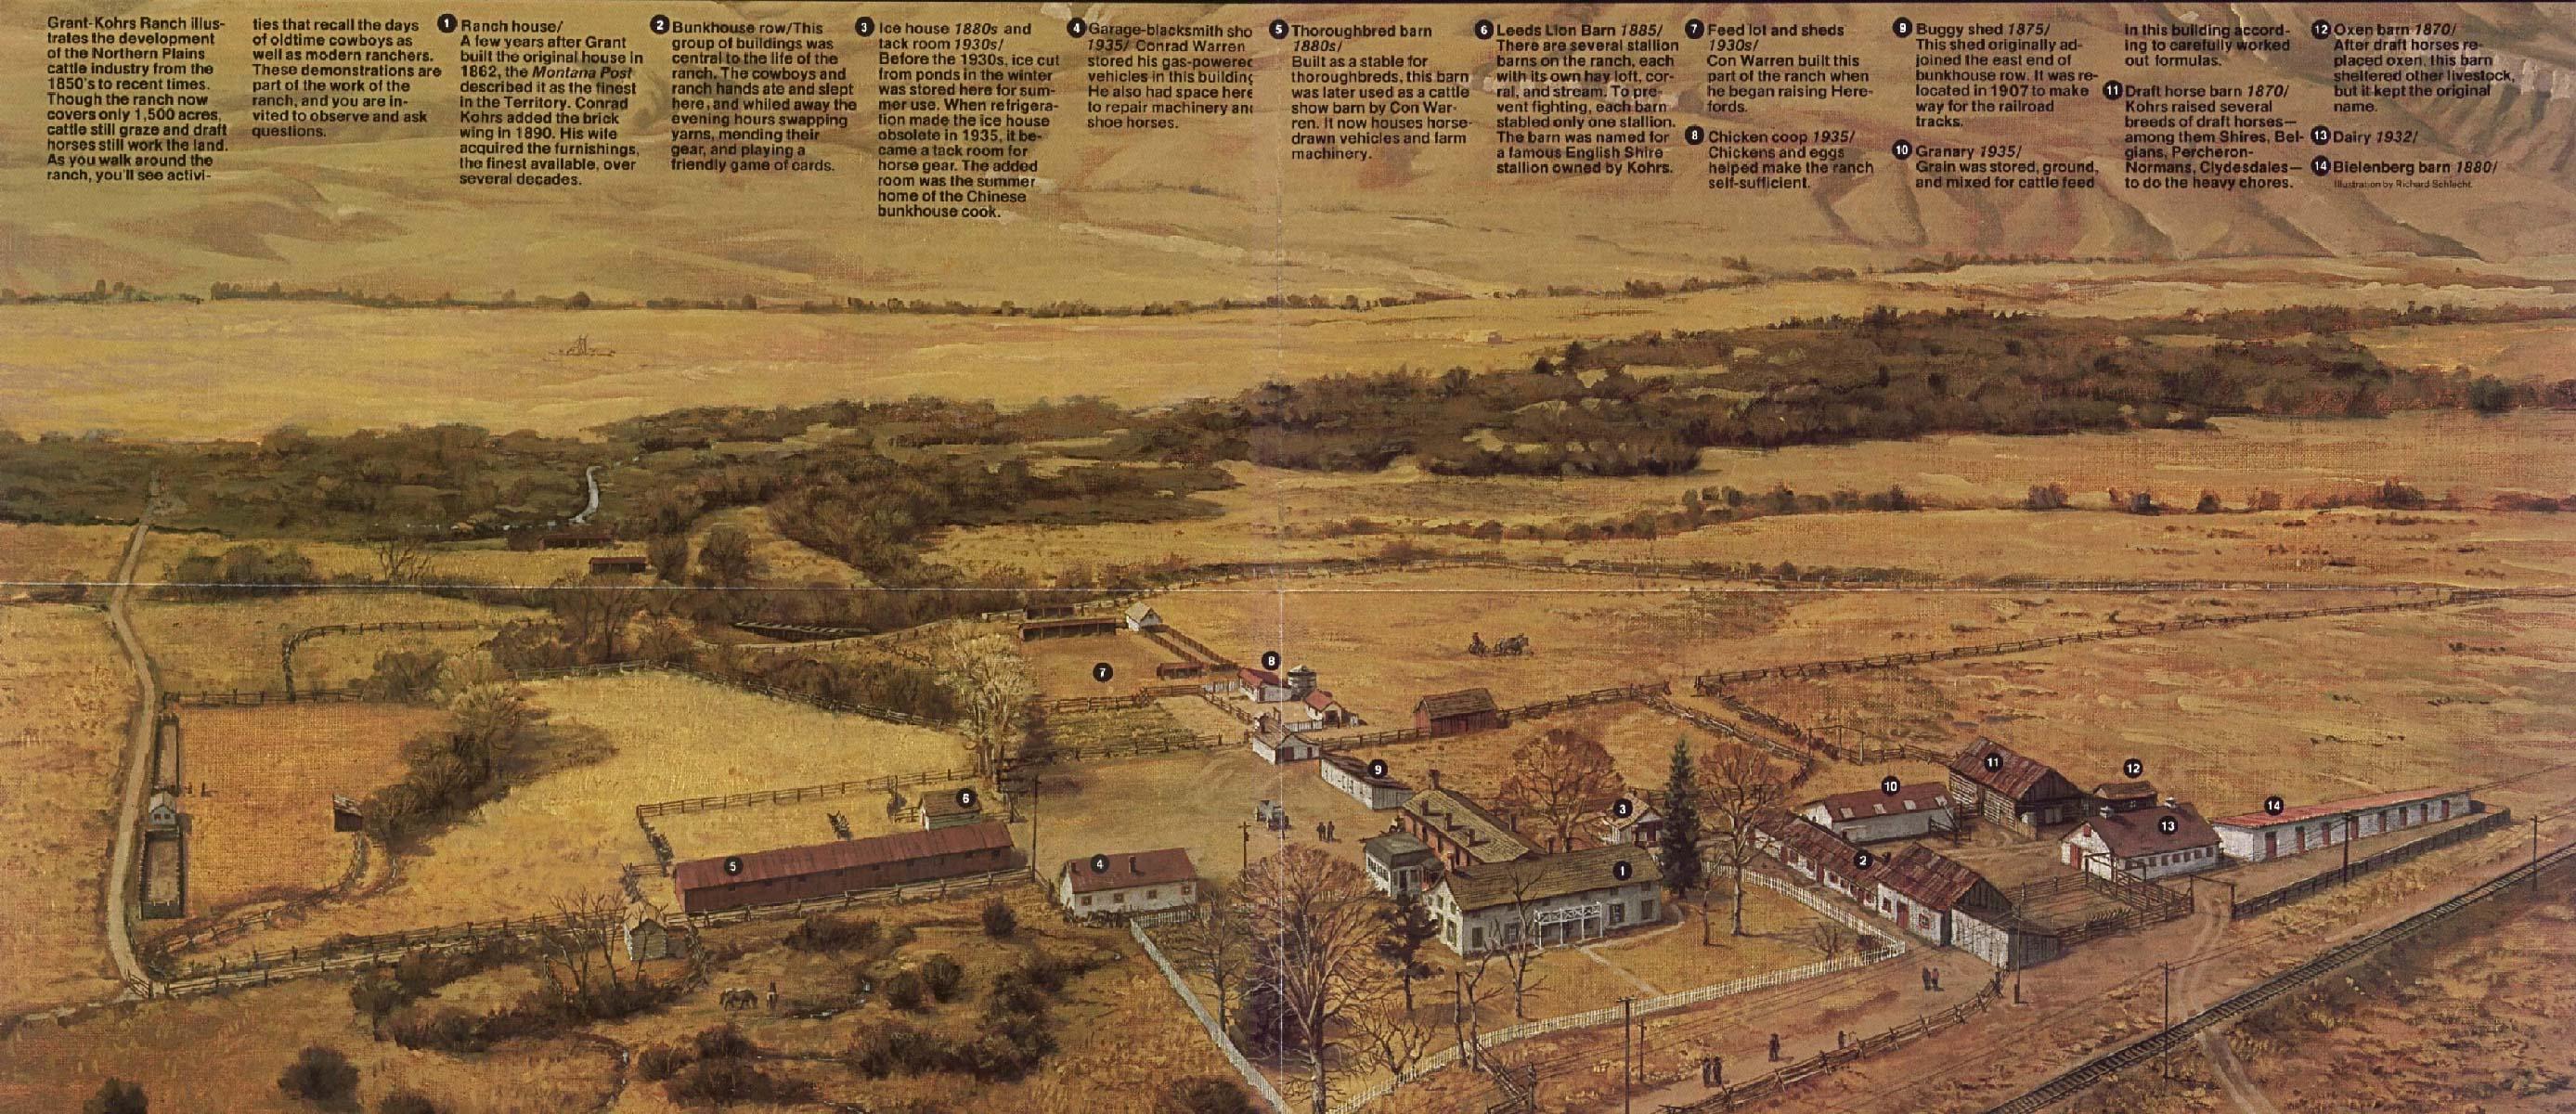 Mapa-Esquema Sitio Histórico Grant-Kohrs Ranch National, Montana, Estados Unidos